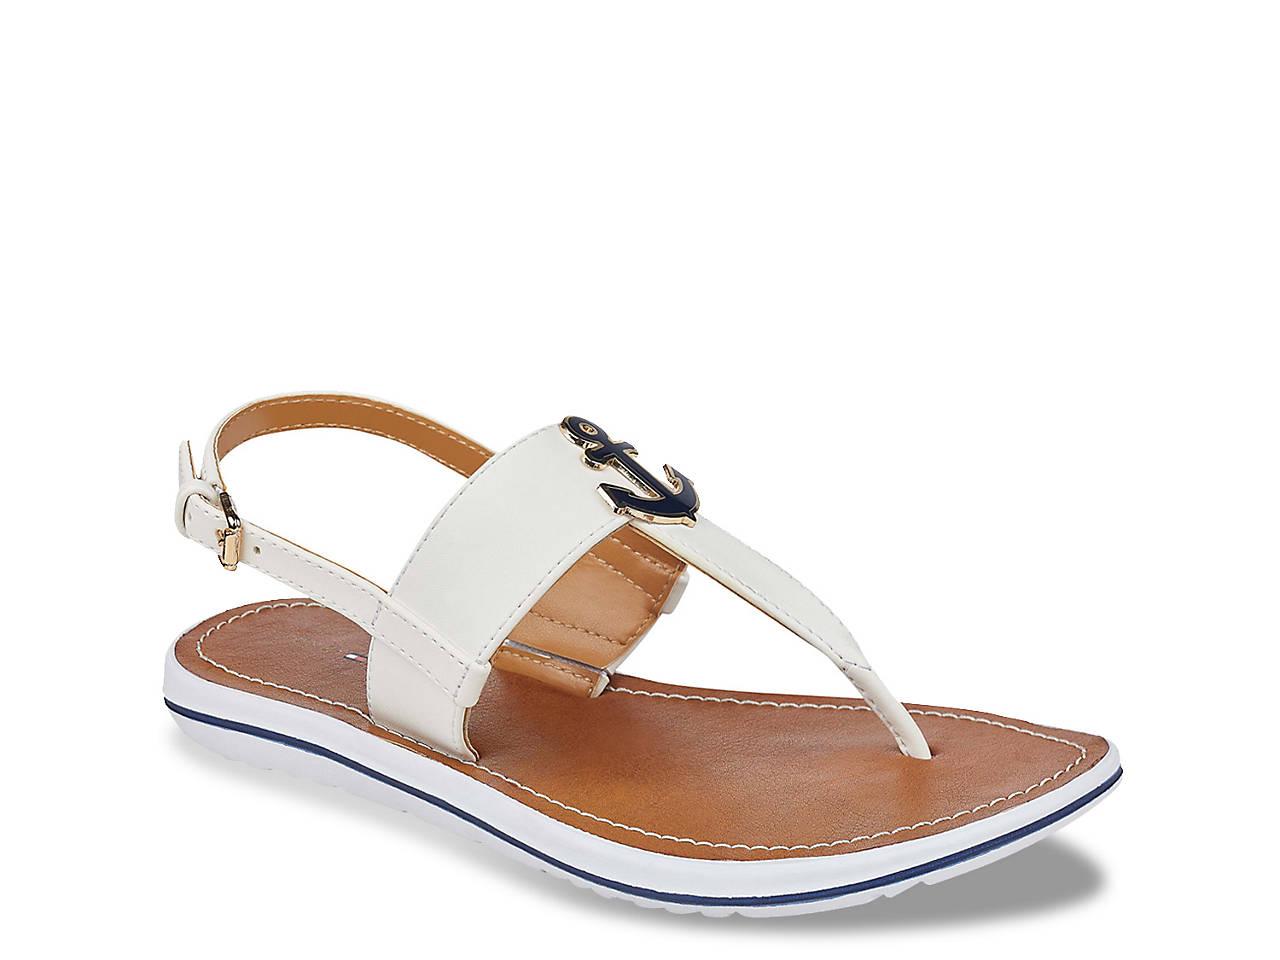 d971f2487cd Tommy Hilfiger Galiant Flat Sandal Men s Shoes